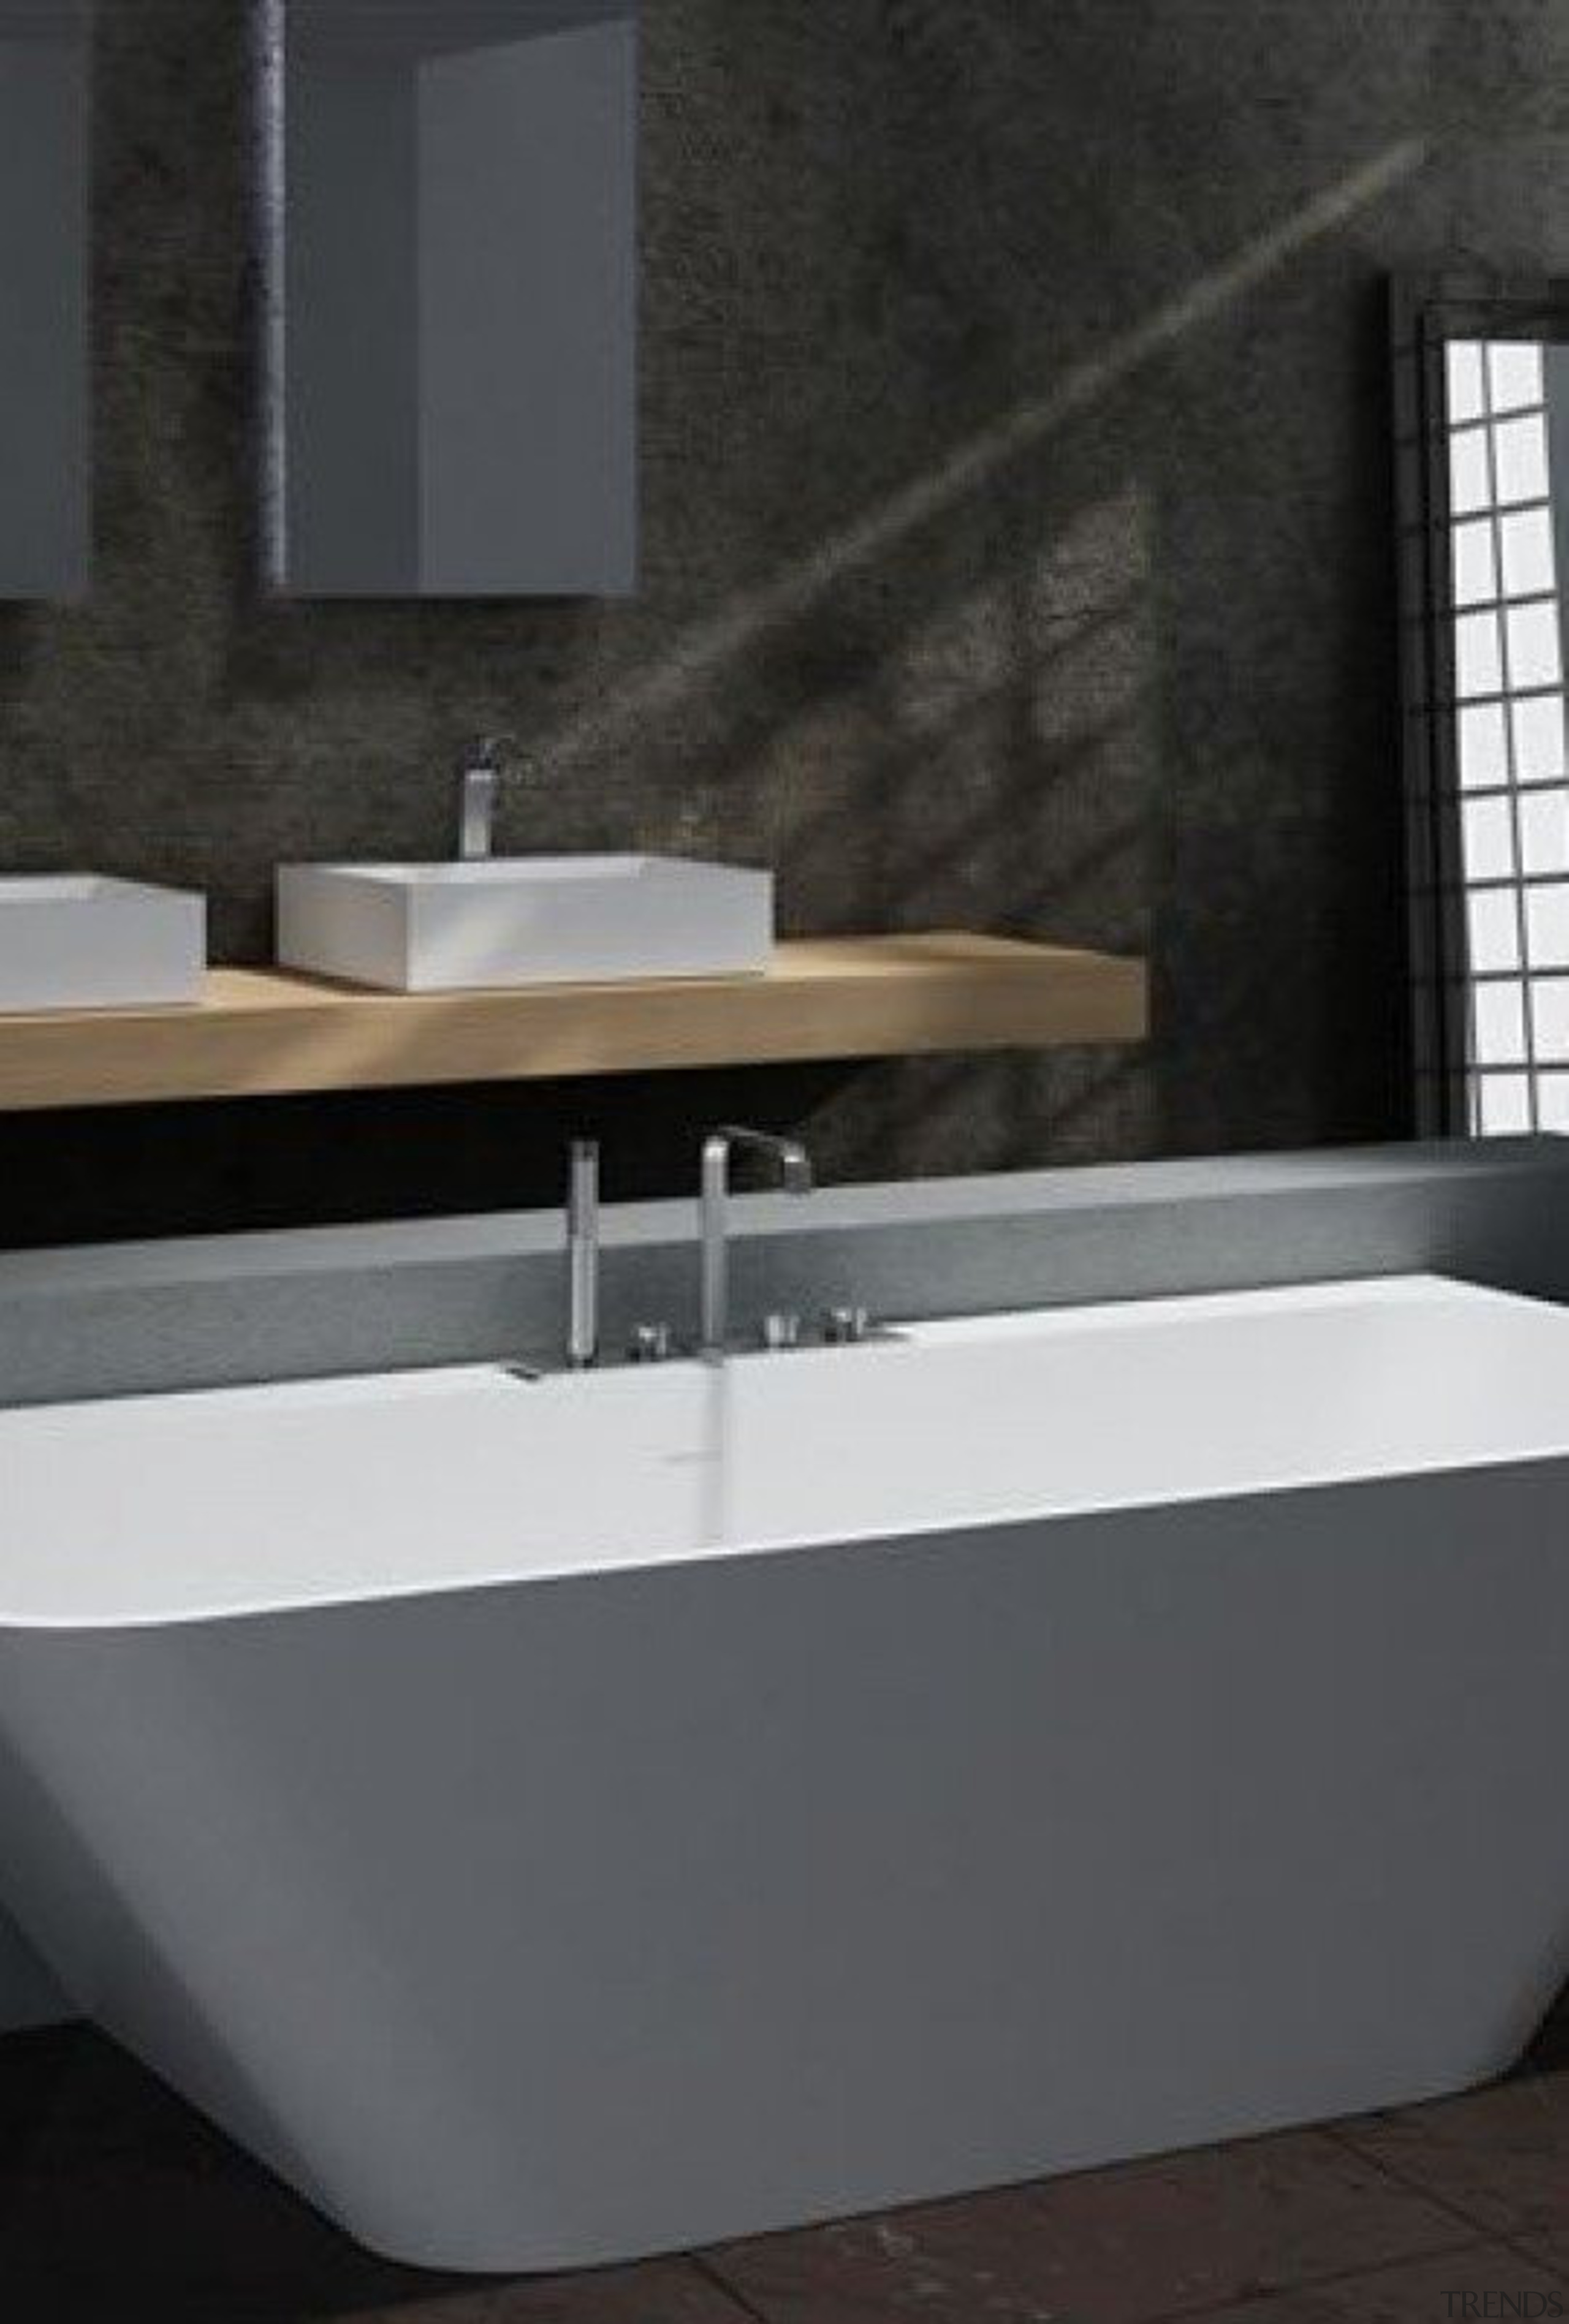 Rubino - angle | bathroom | bathroom sink angle, bathroom, bathroom sink, bathtub, floor, interior design, plumbing fixture, product design, sink, tap, black, gray